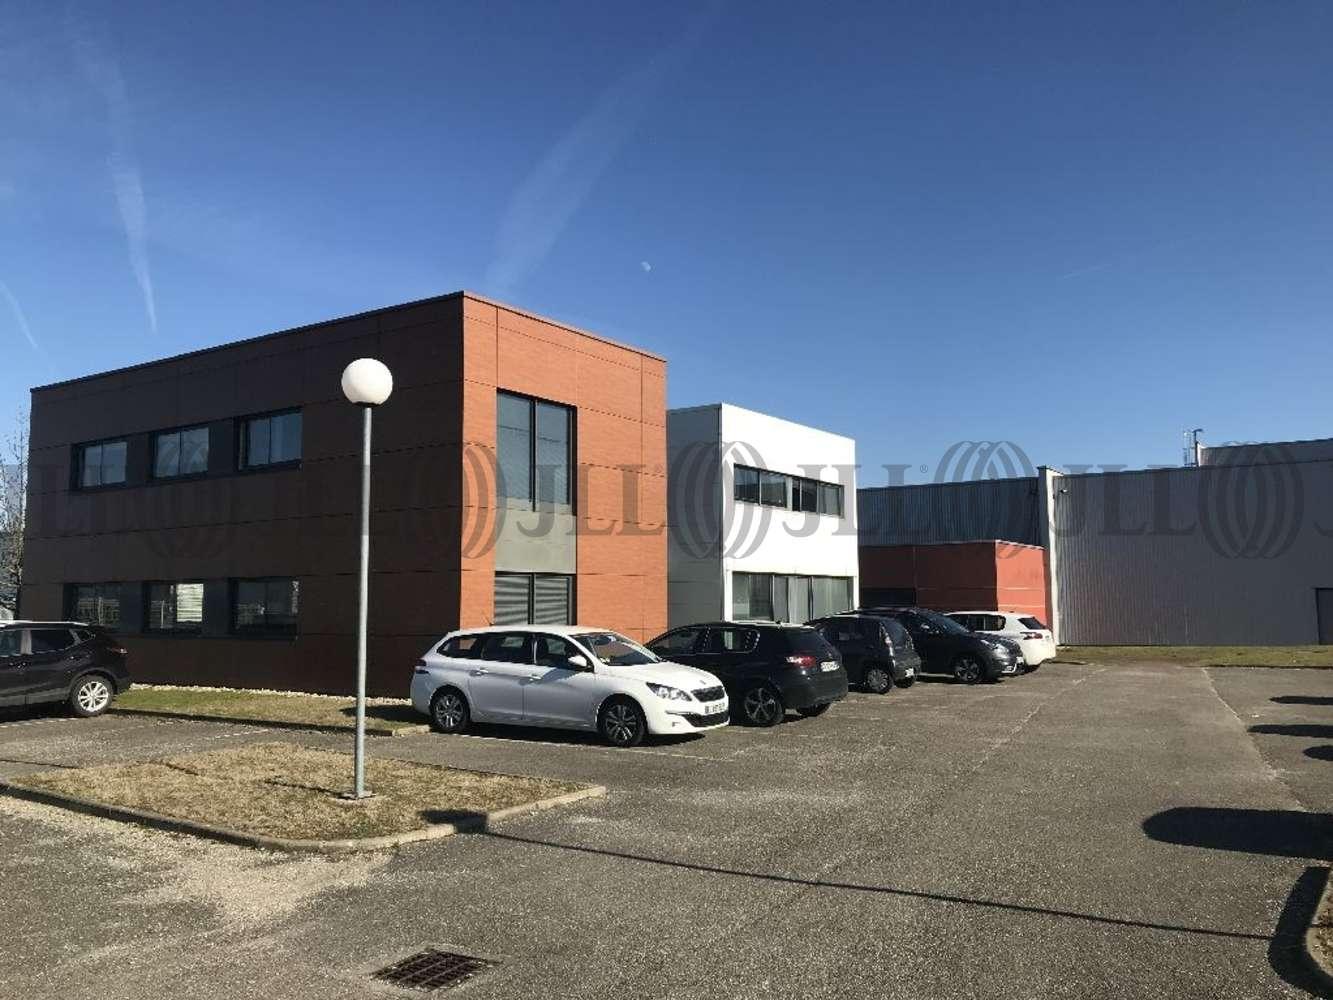 Activités/entrepôt Genas, 69740 - Location entrepot Genas / Lyon Est - 10319659